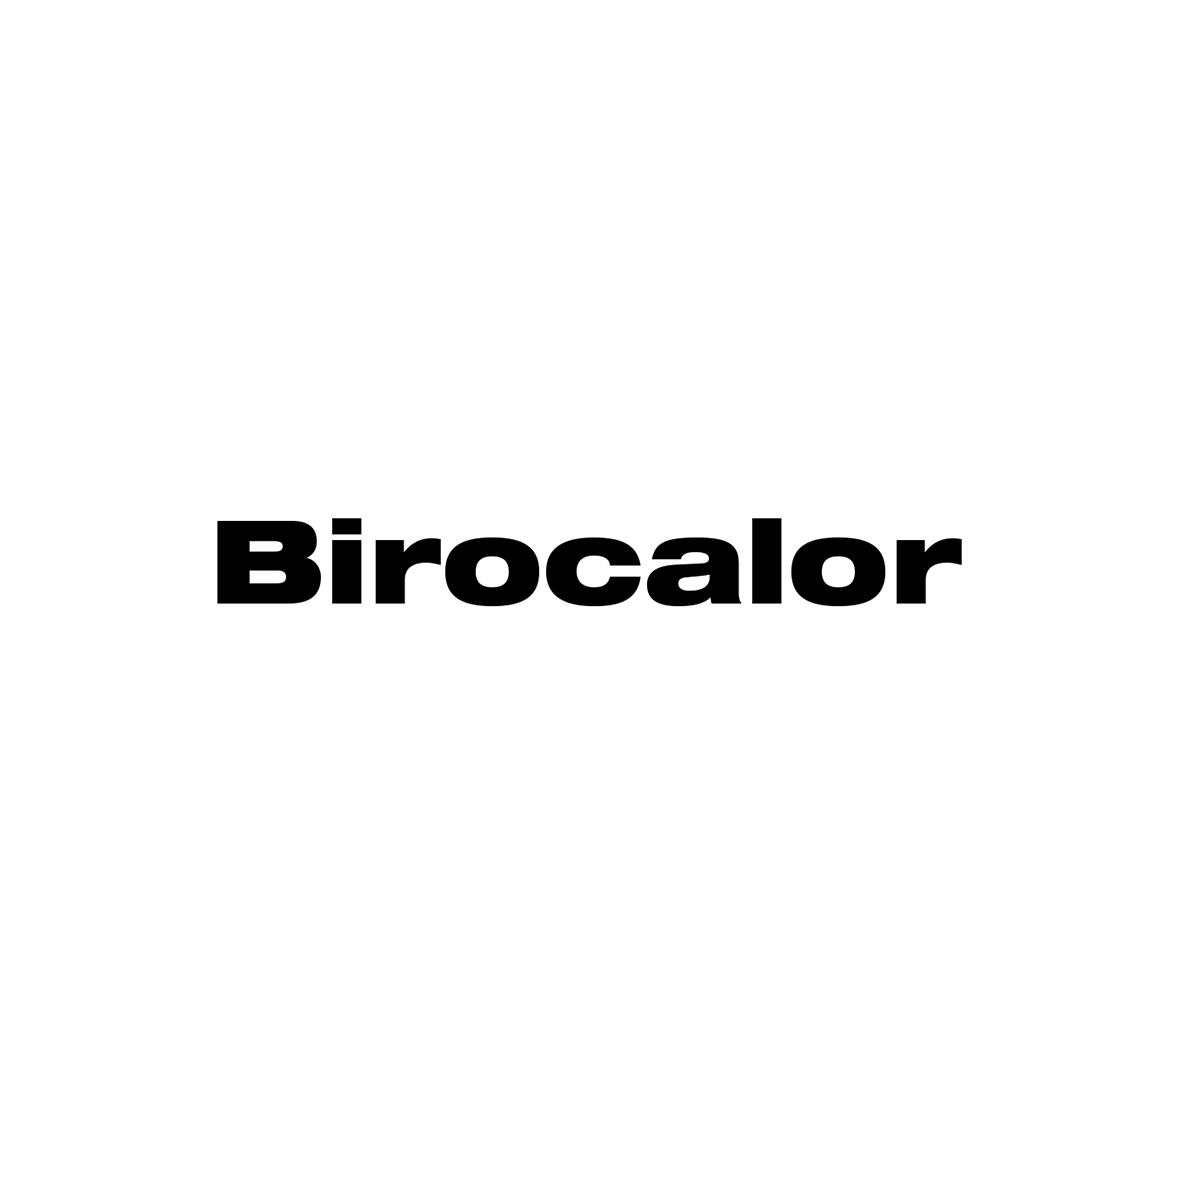 Birocalor